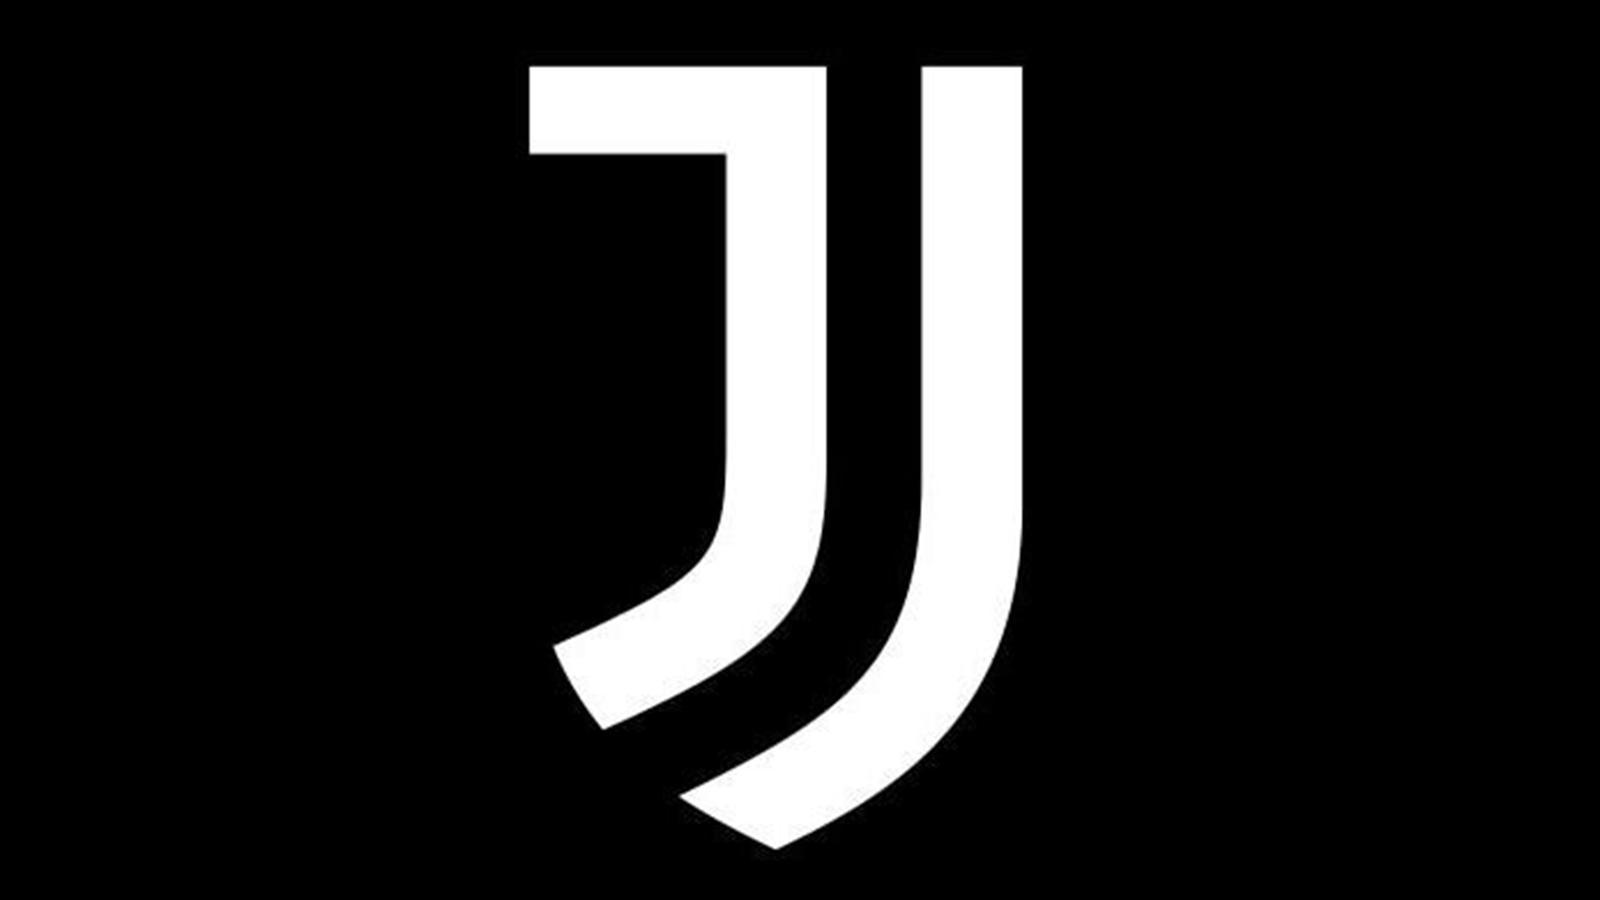 la juventus presenta il nuovo logo  agnelli  quot definisce il nike logo png transparent background nike logo png transparent